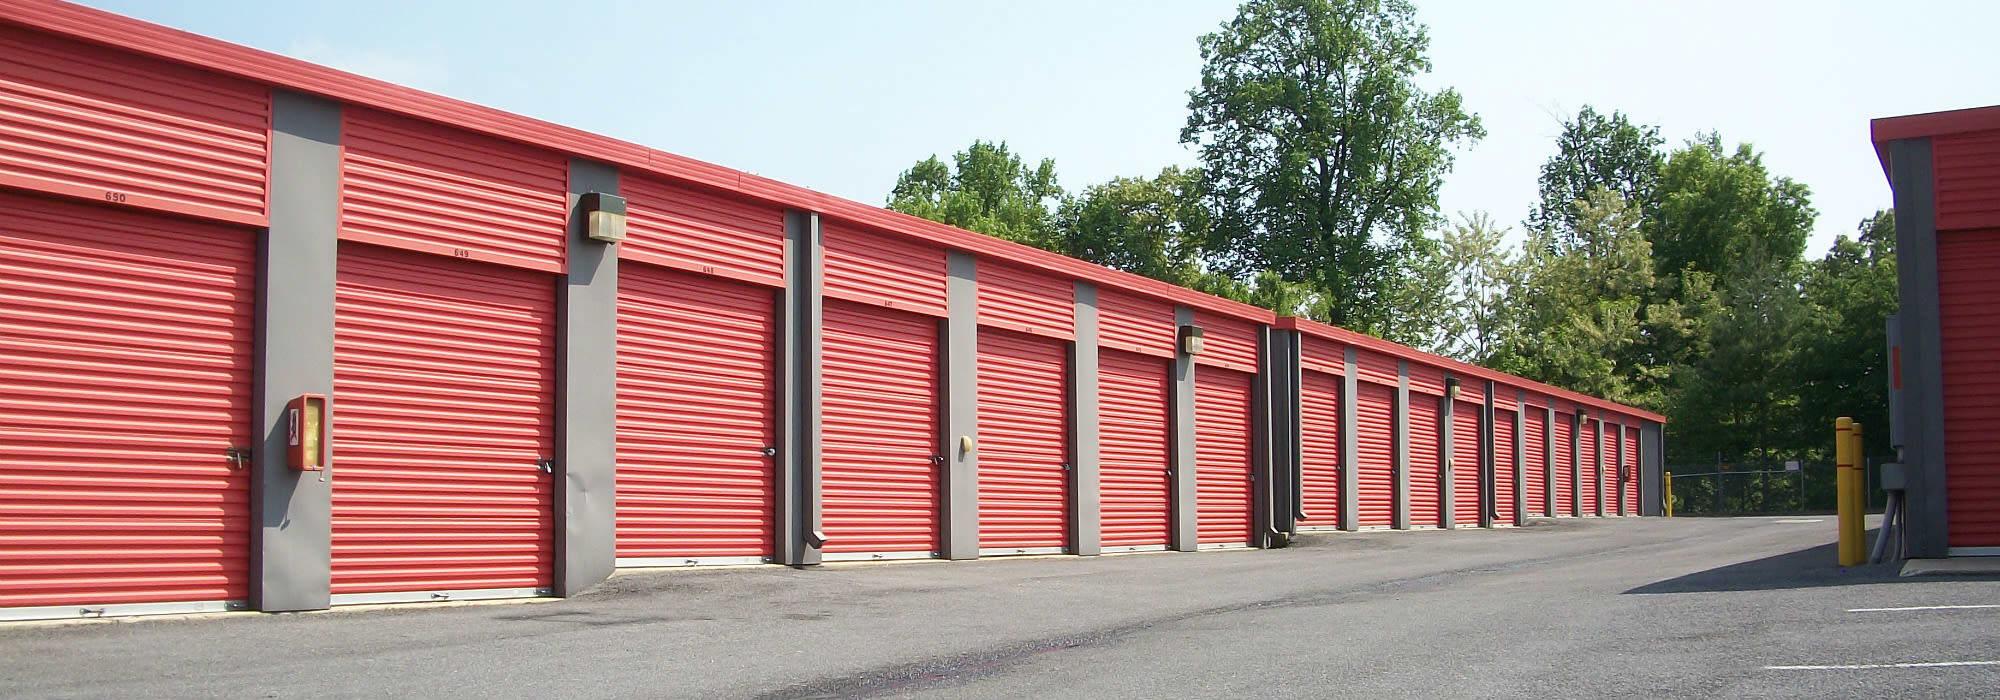 Self storage in Laurel MD